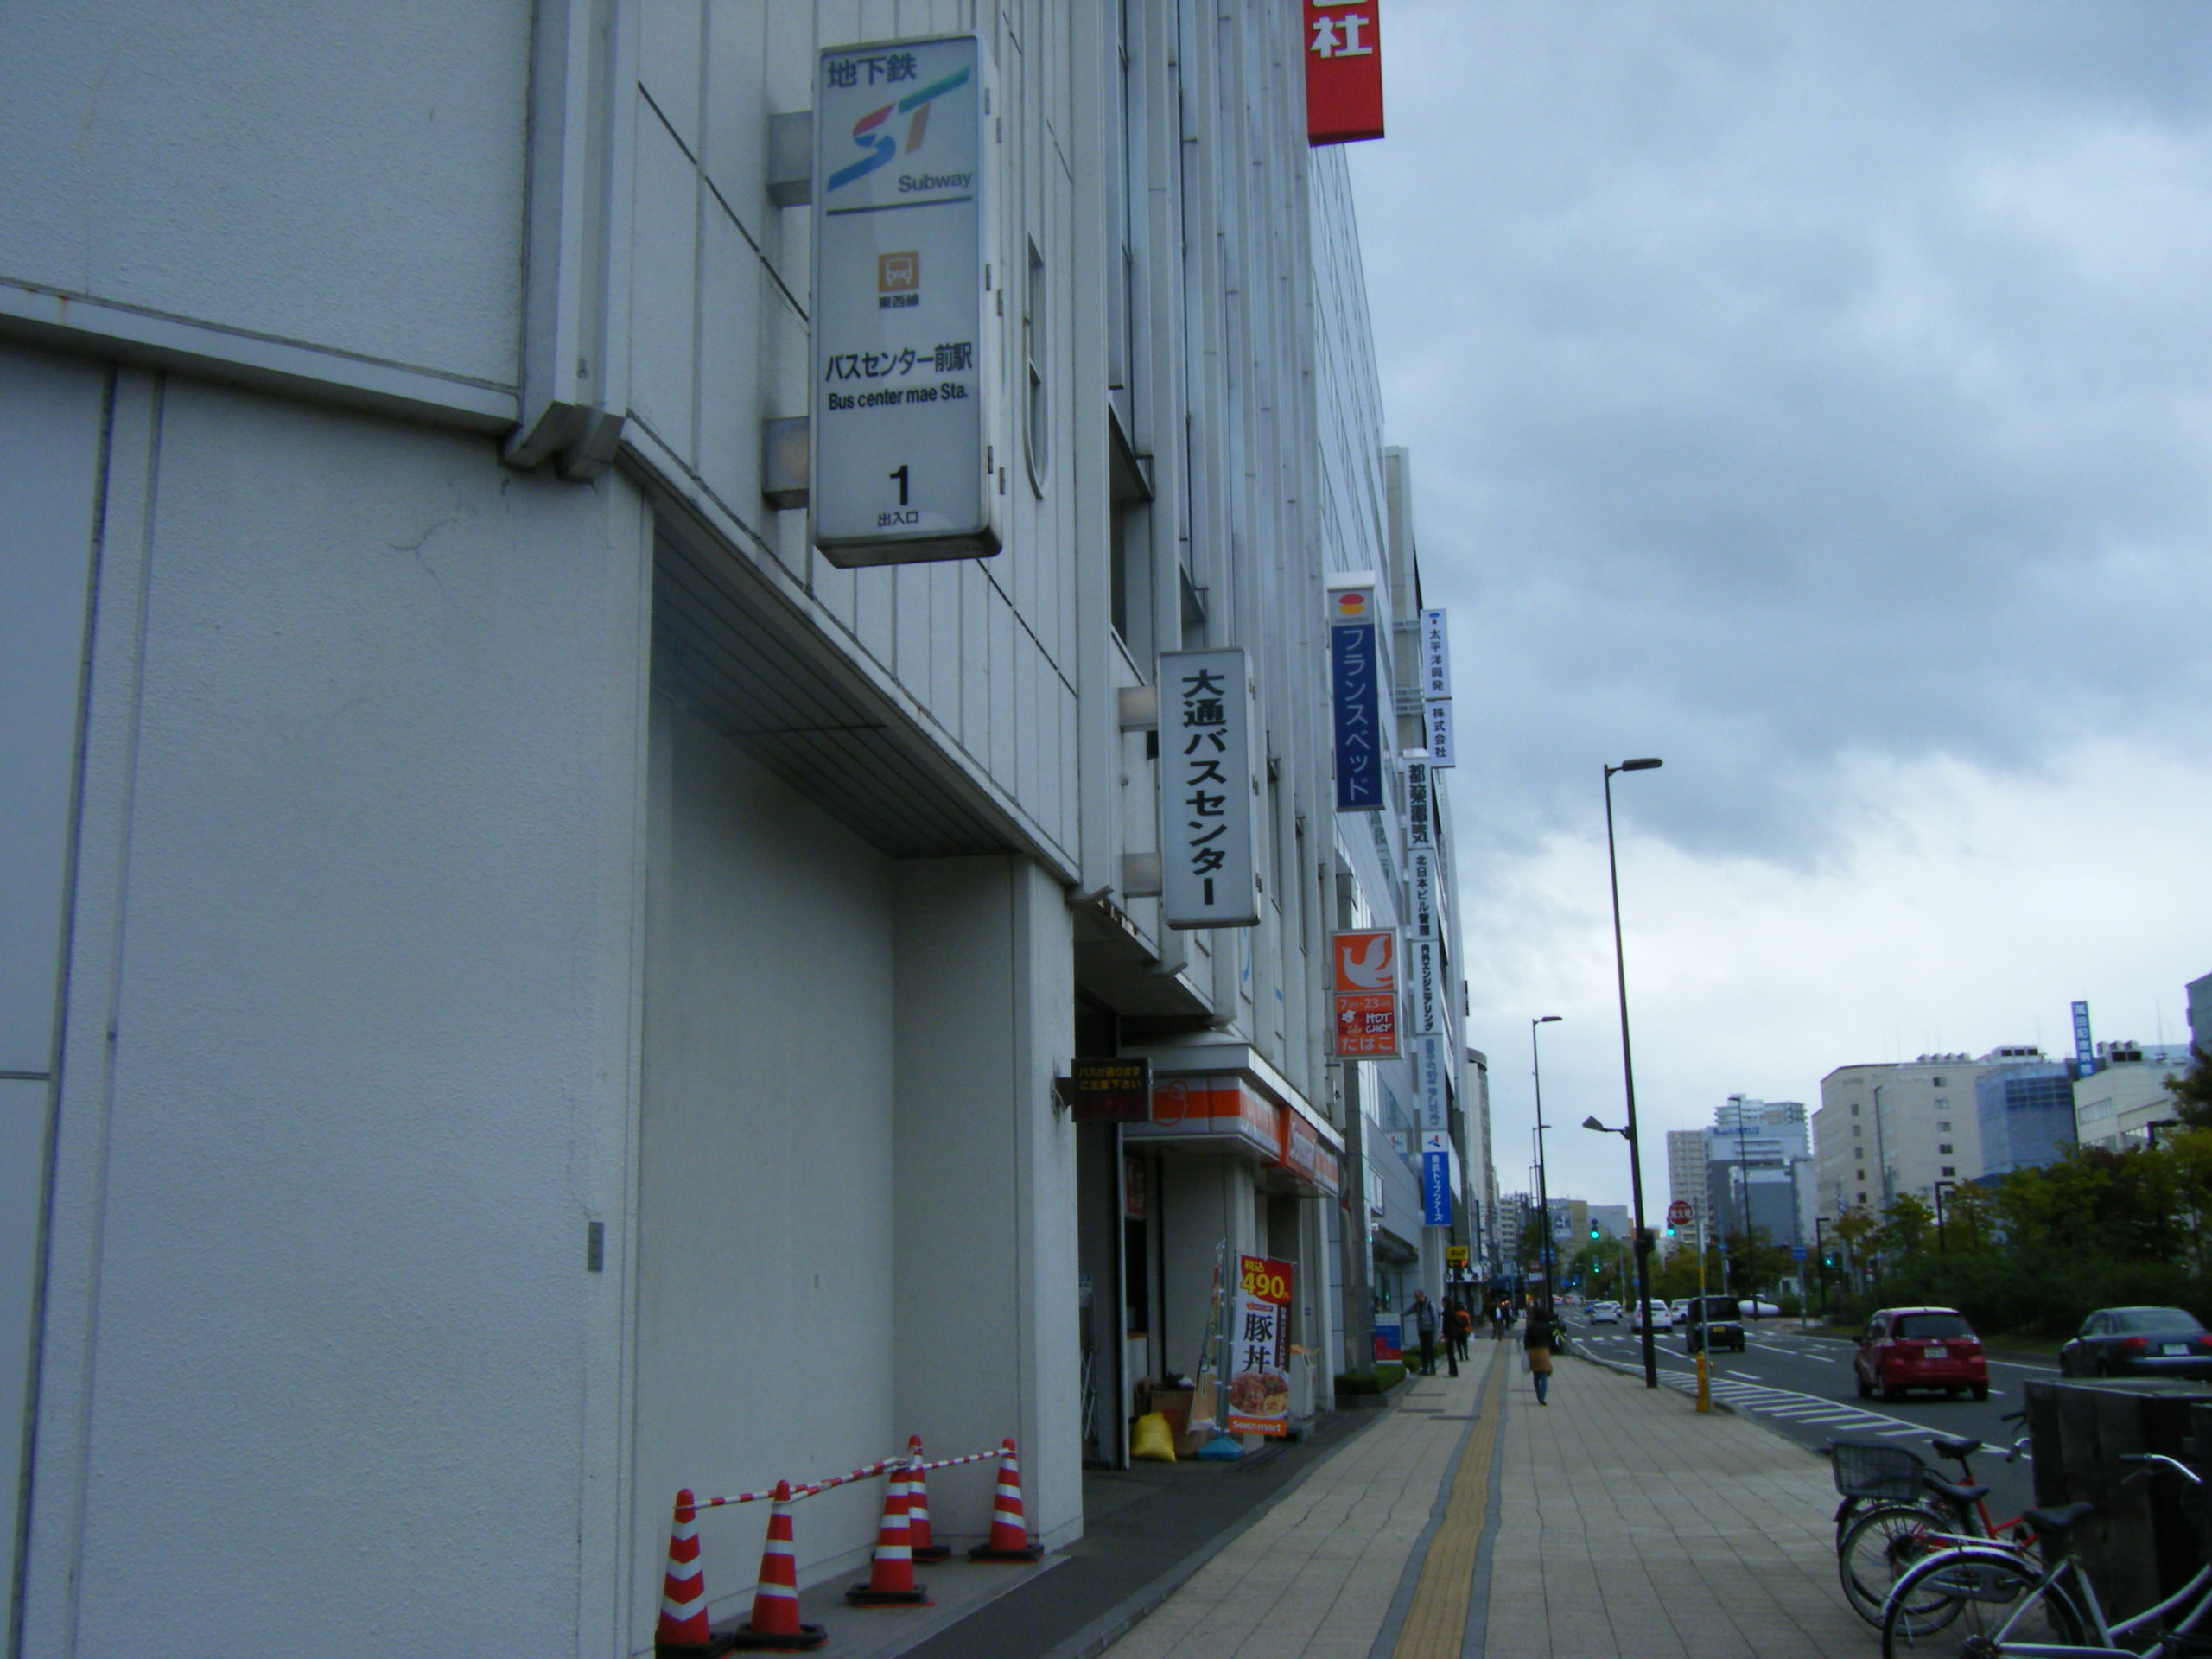 札幌市営地下鉄東西線バスセンター前駅